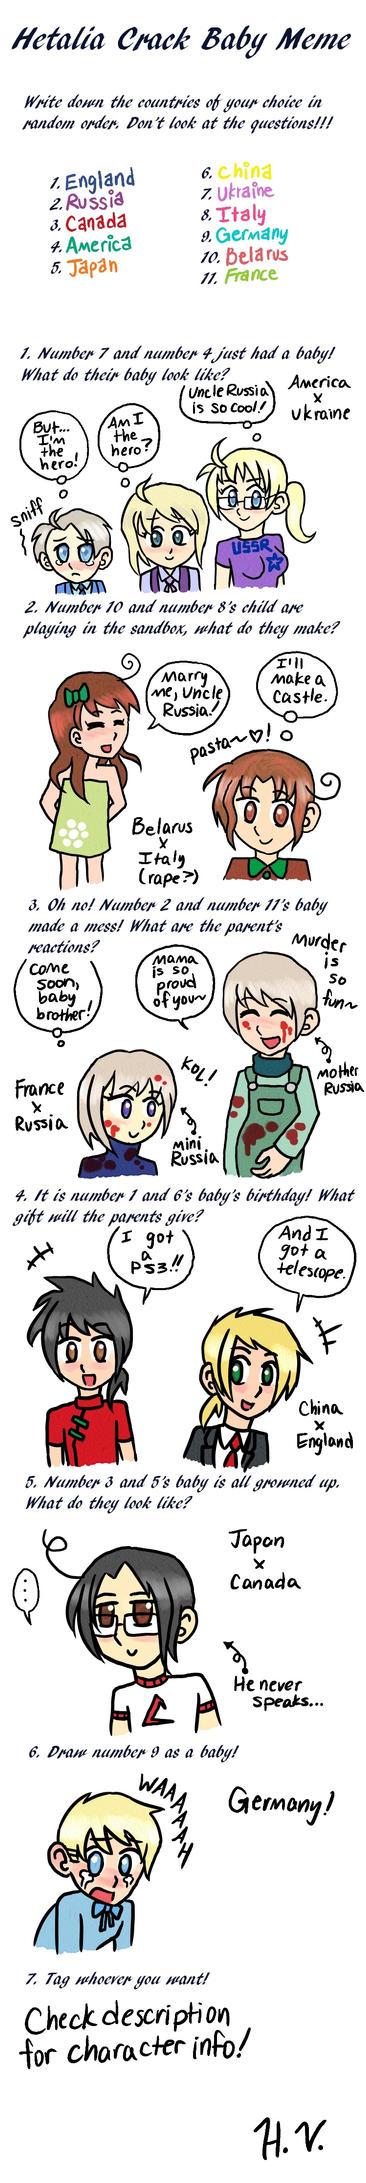 APHetalia Crack Baby Meme by HibikiVenture